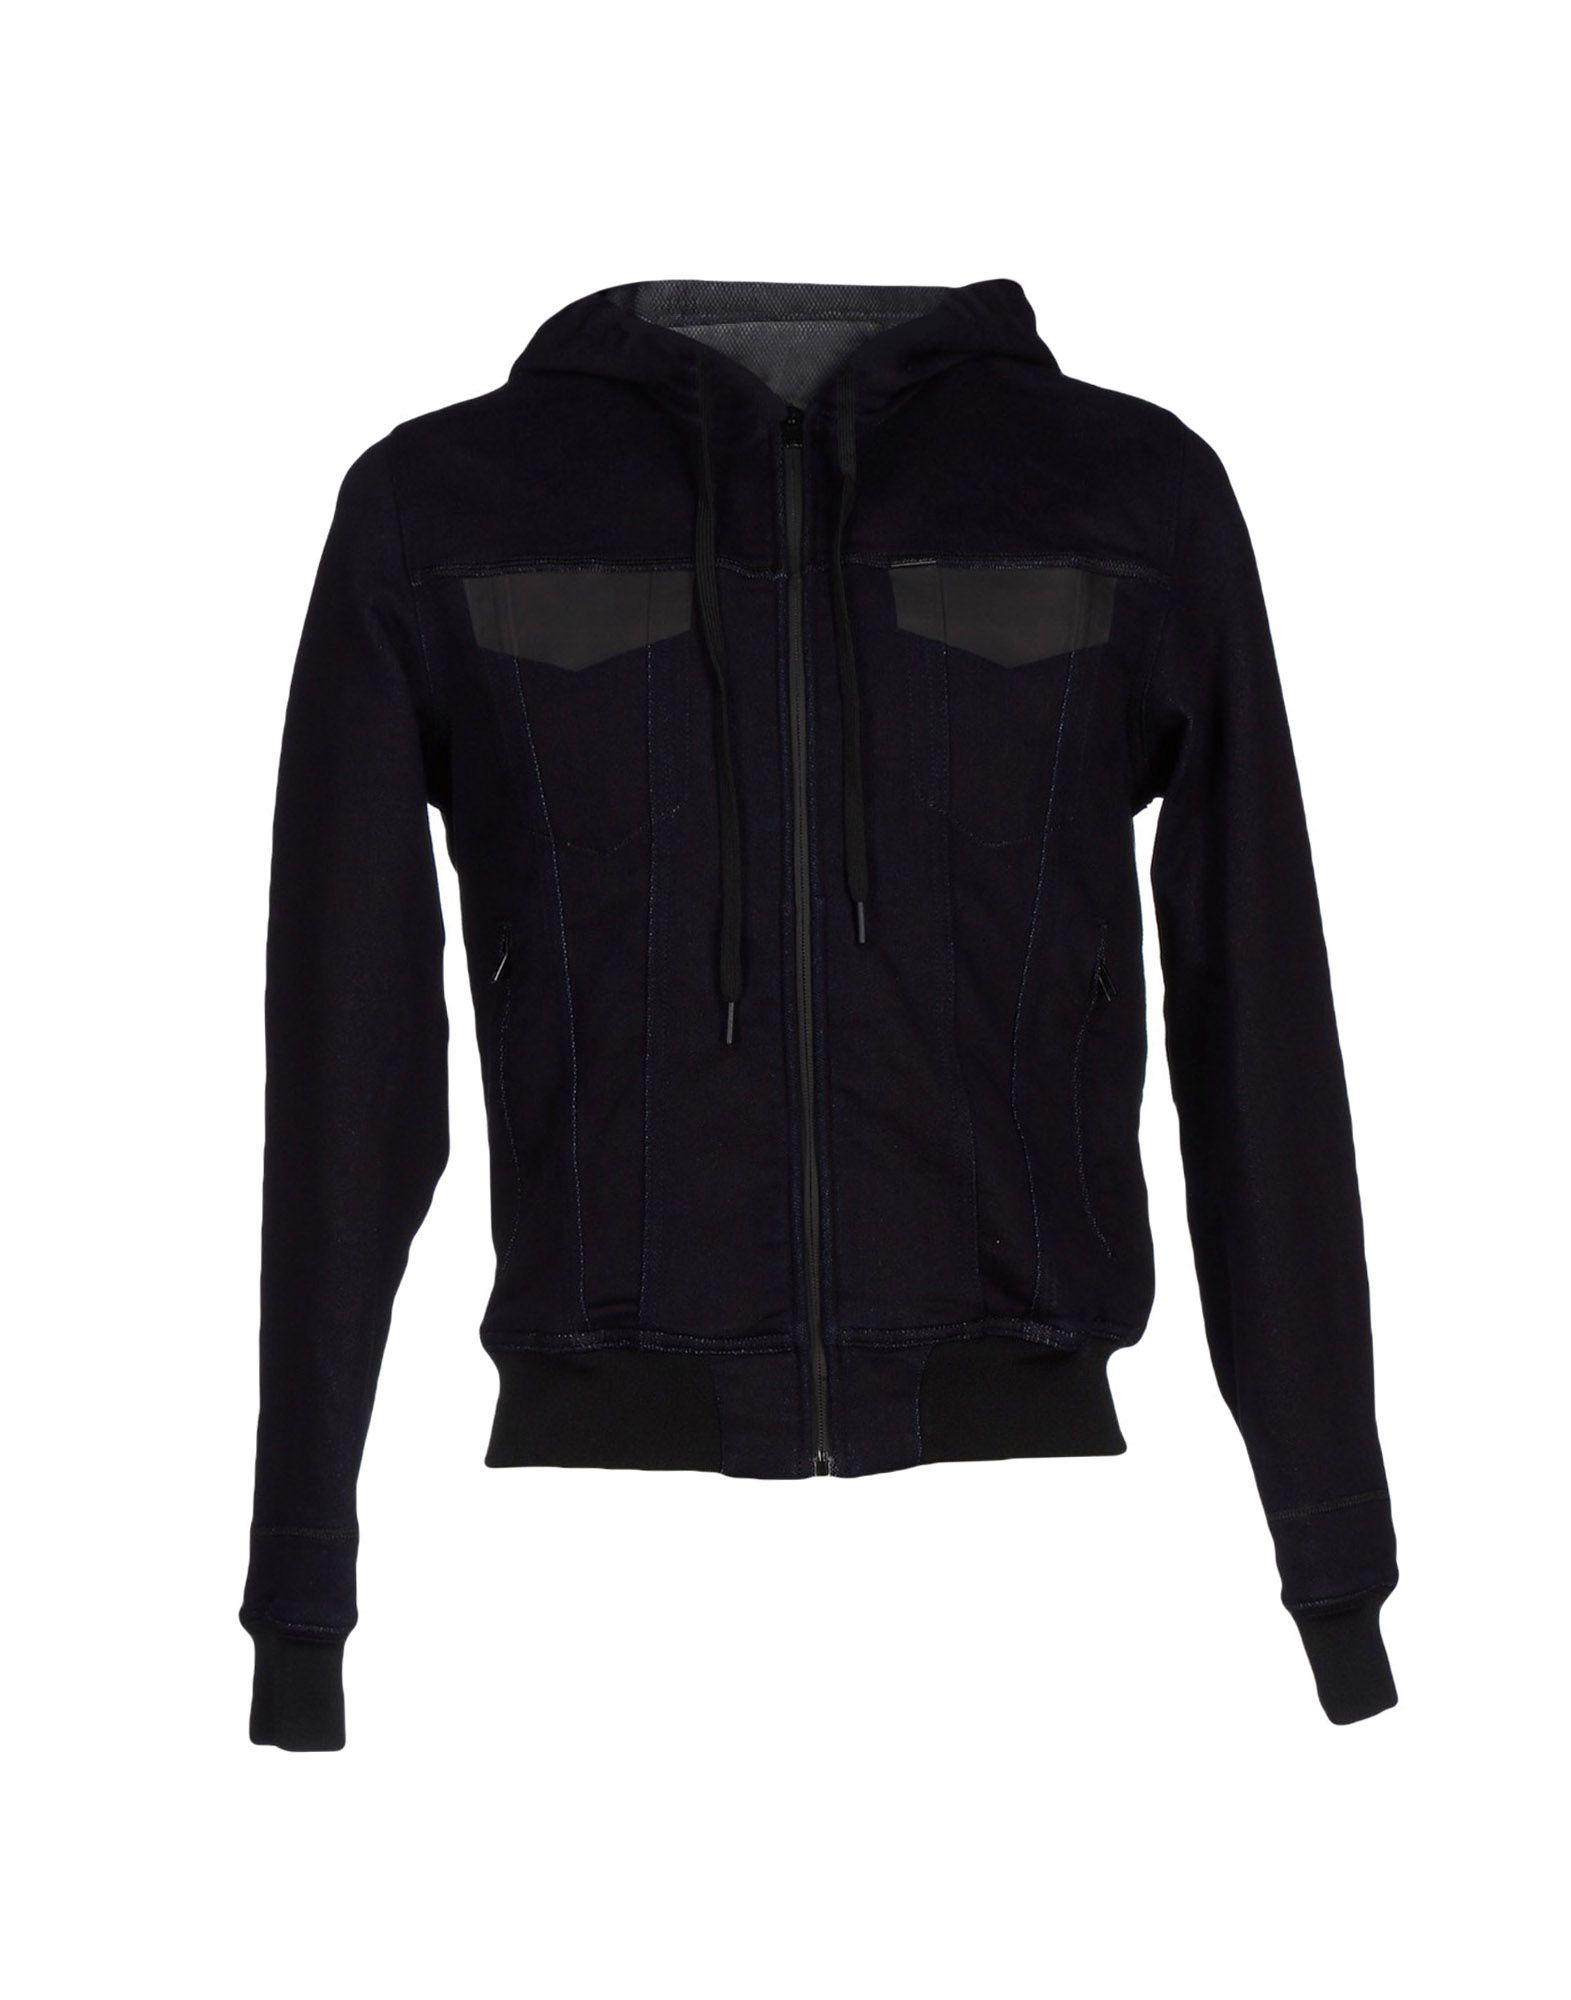 Diesel Denim Jacket - Men Diesel Denim Jackets online on YOOX ...